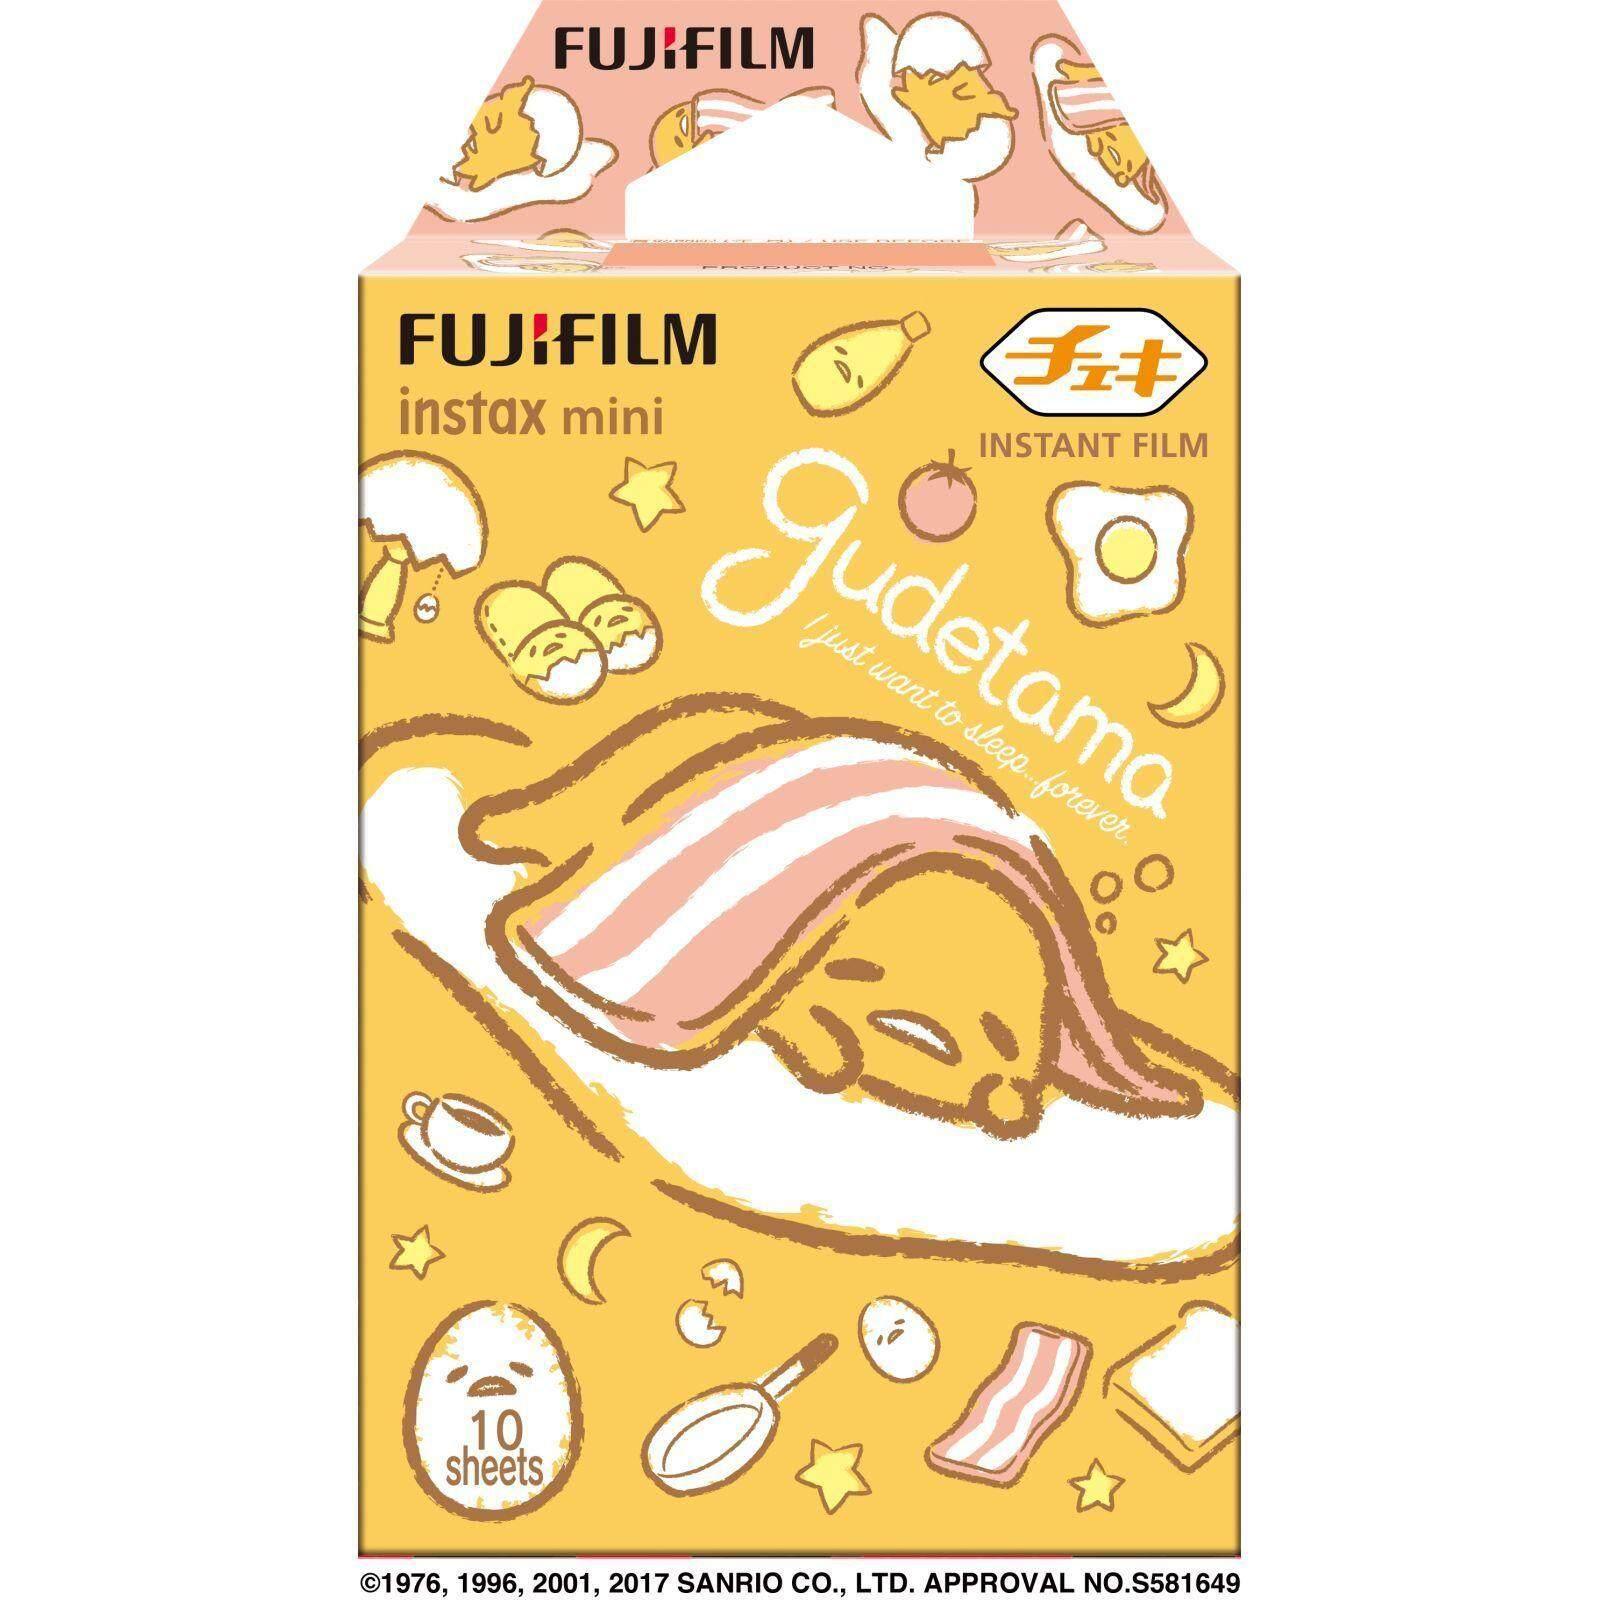 FUJIFILM INSTAX Mini Gudetama Instant Film (10 Sheets)